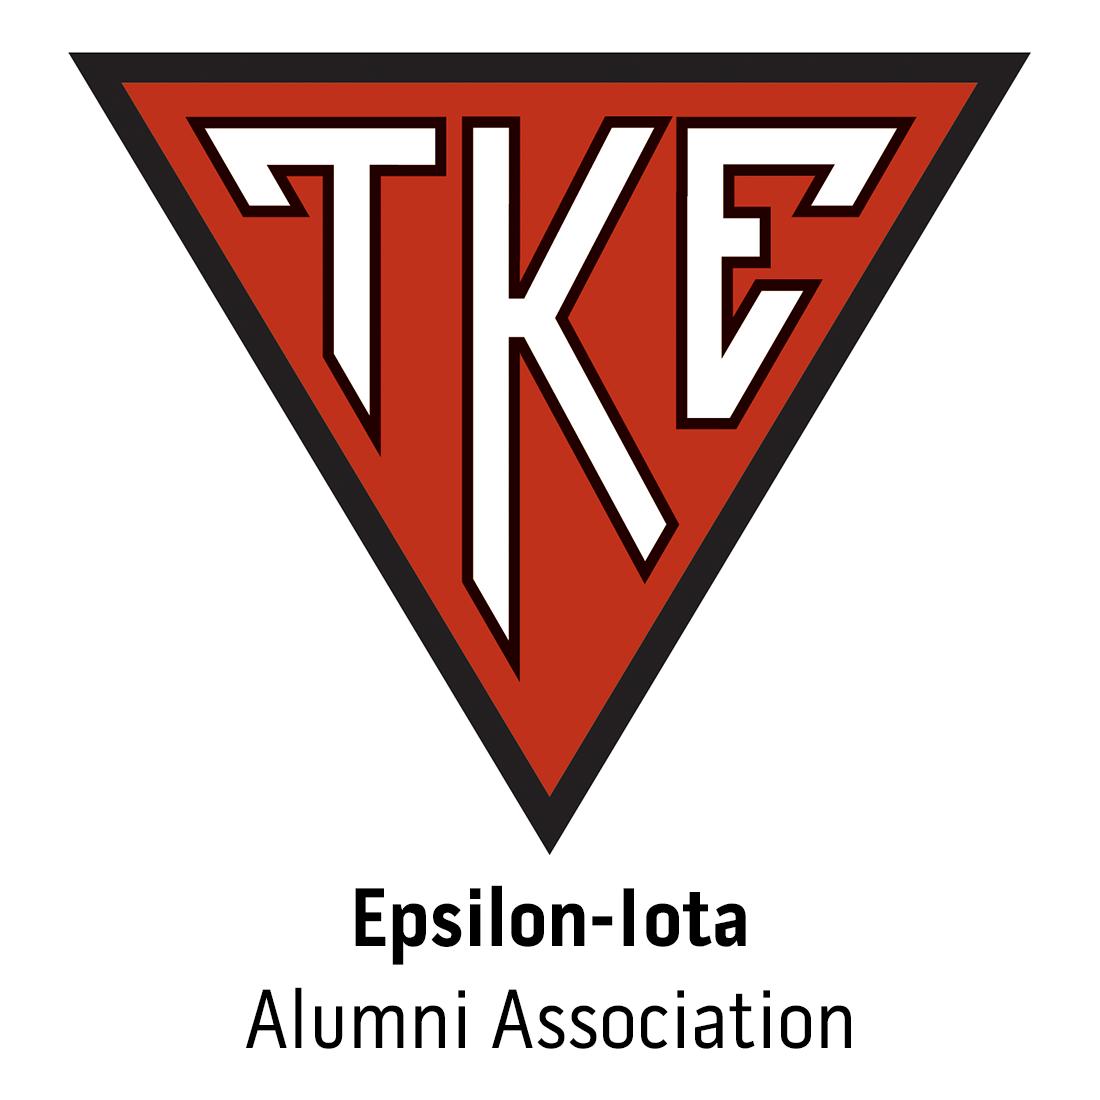 Epsilon-Iota Alumni Association at Youngstown State University